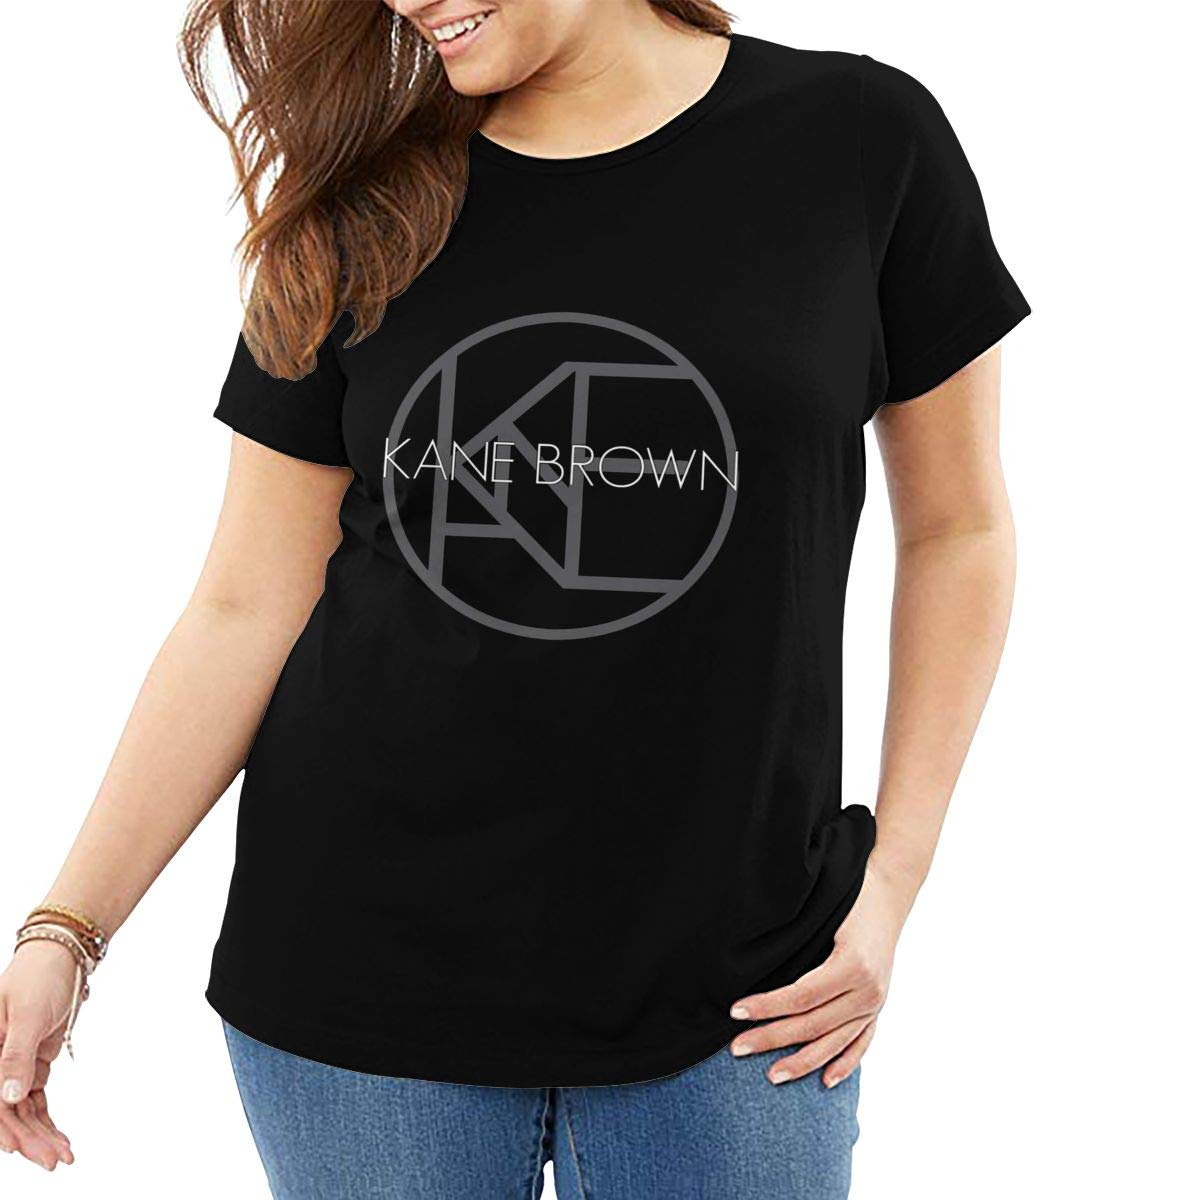 Patricia Fort Short Sleeve Tshirt Loose Kane Brown Logo Black